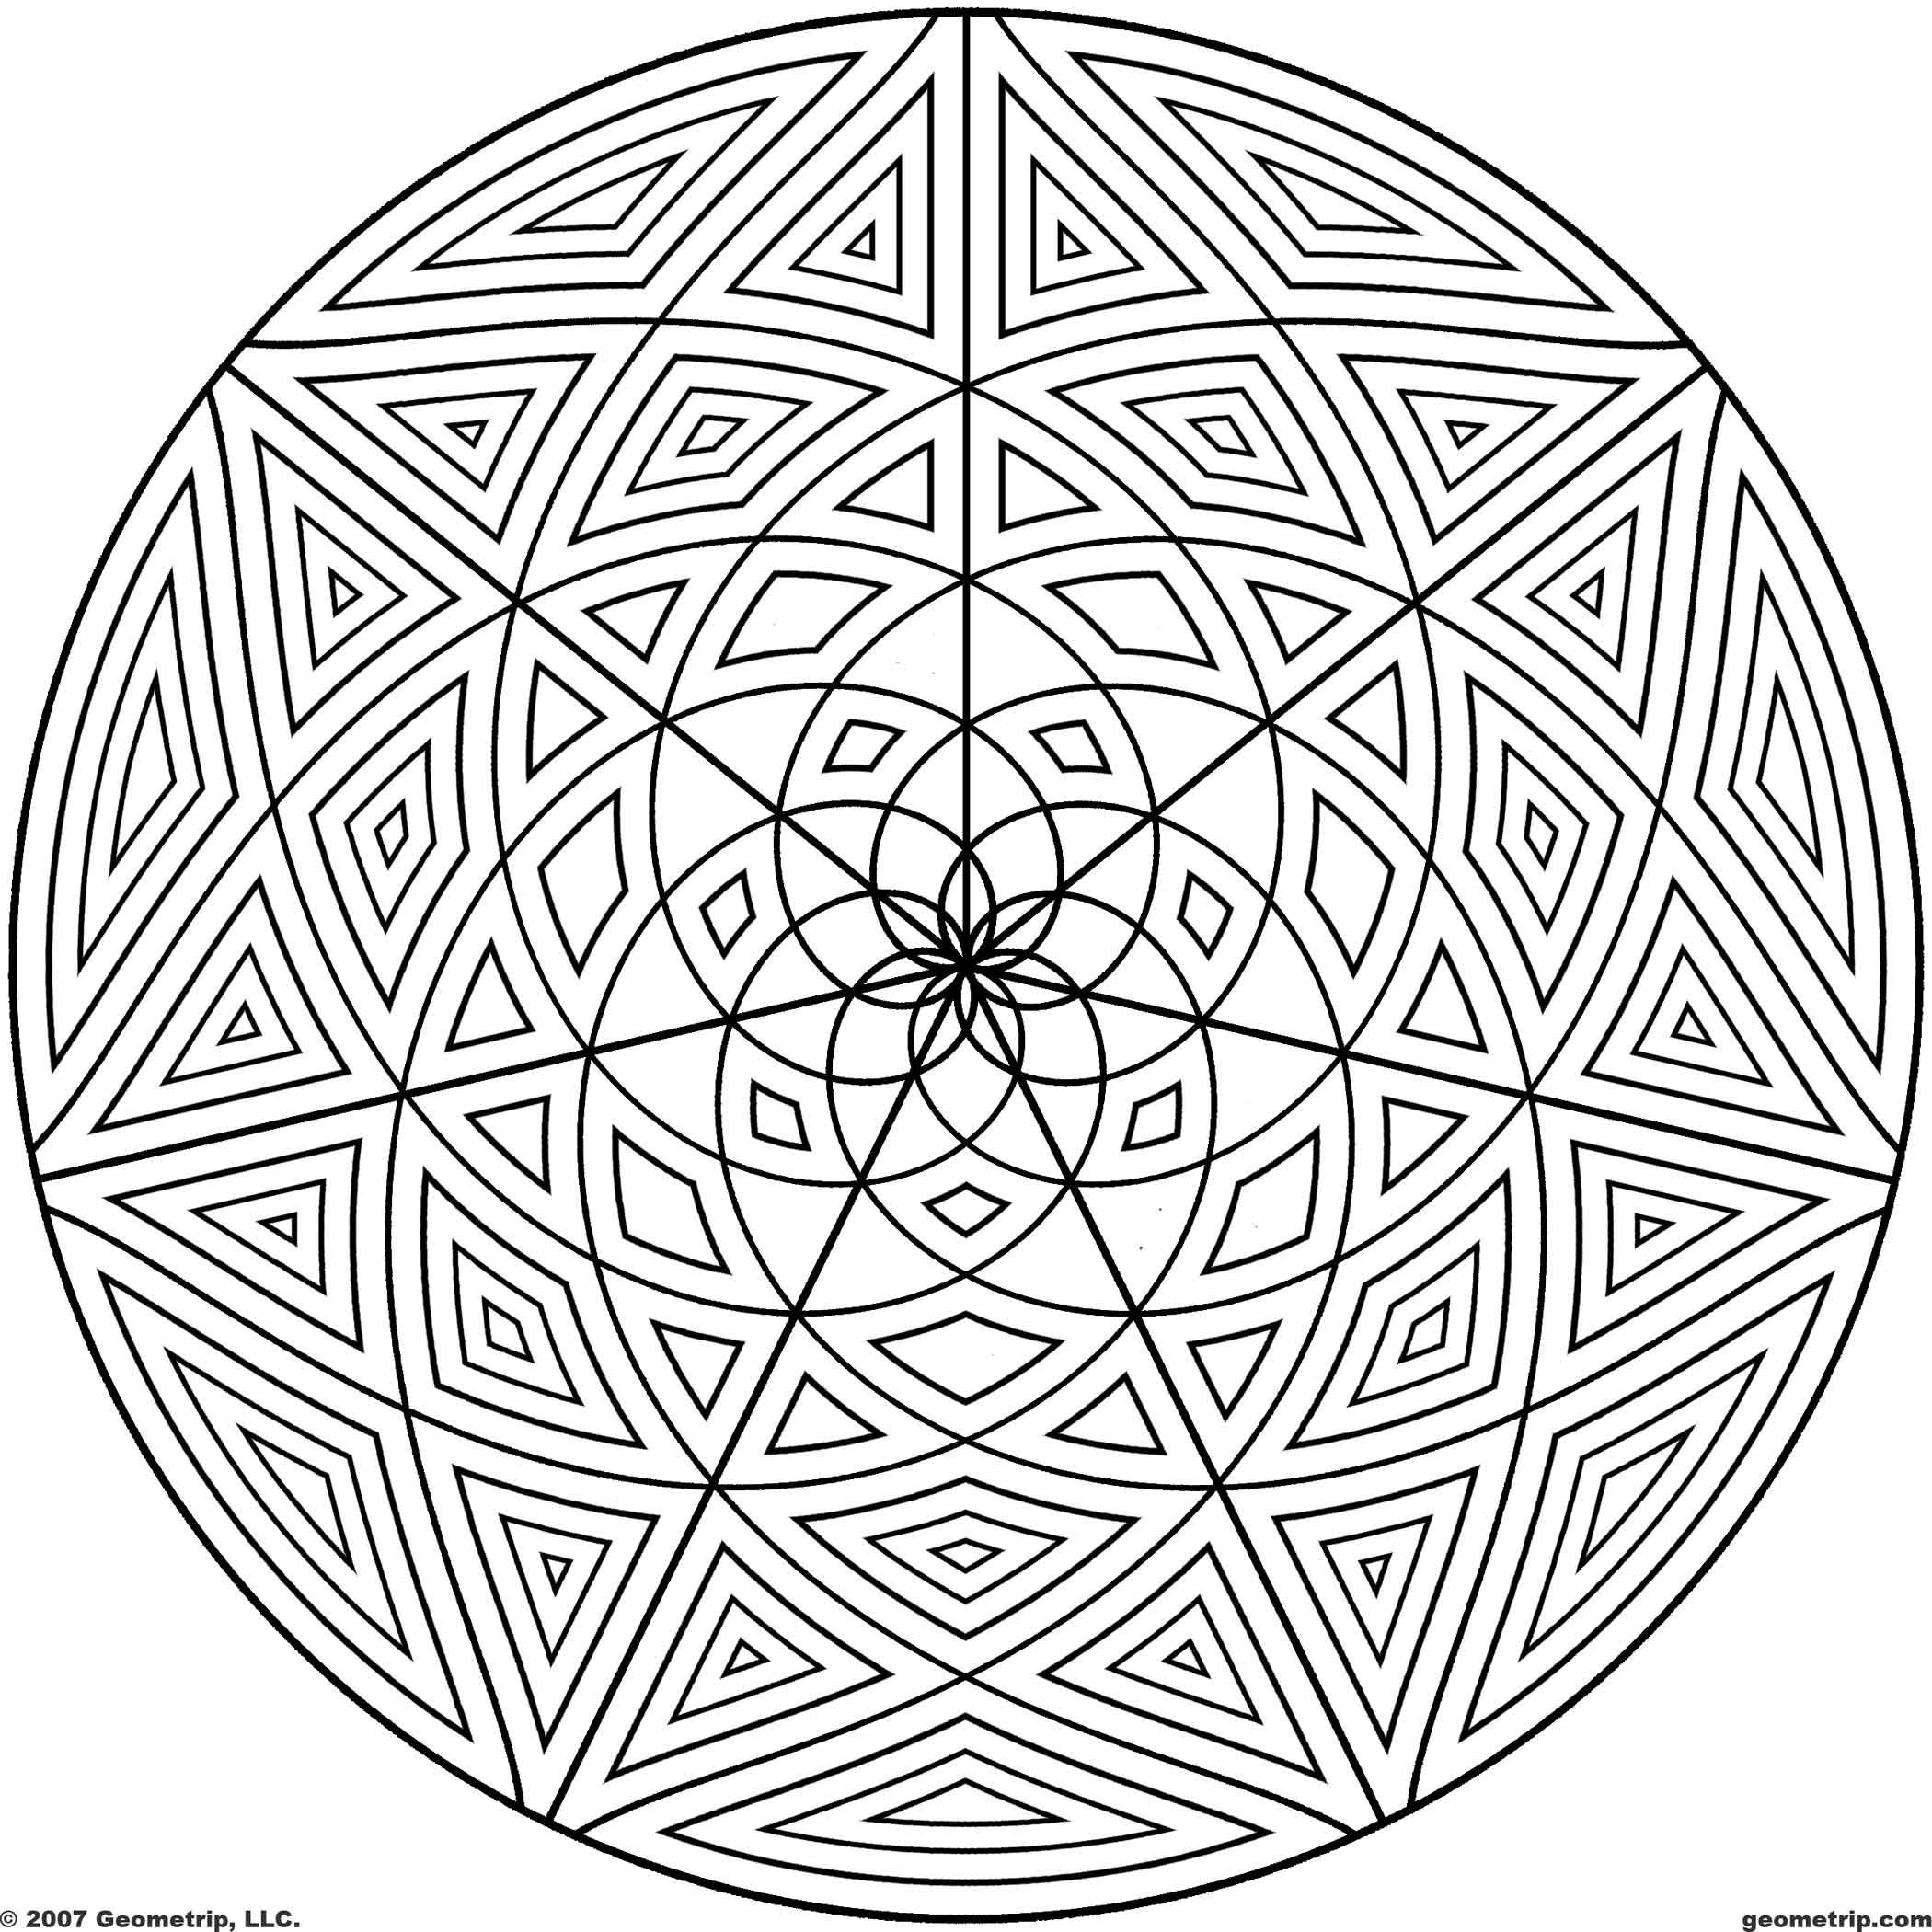 Geometric Page Pattern Coloring Sheets | Geometrip.com - Free ...